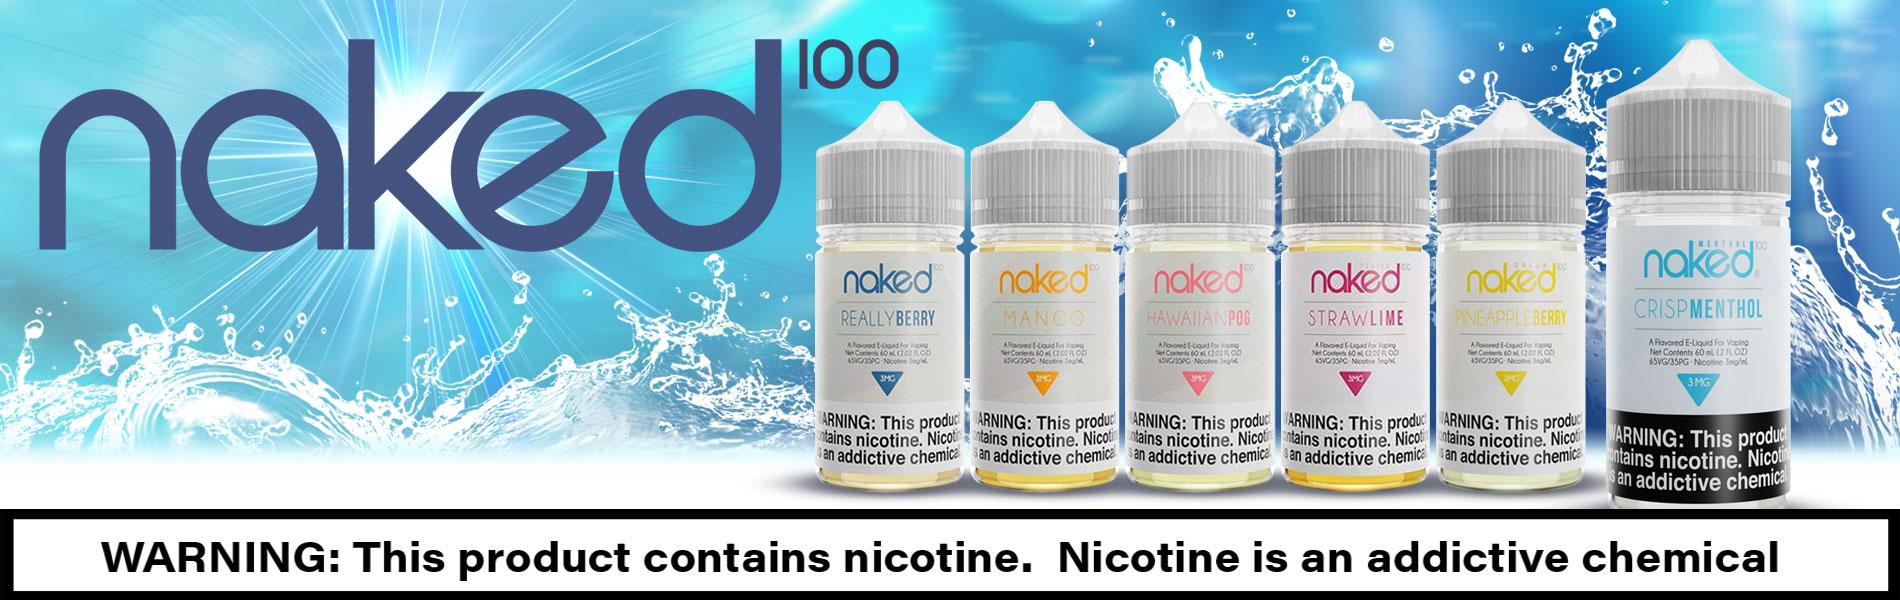 Naked 100 E-Juice